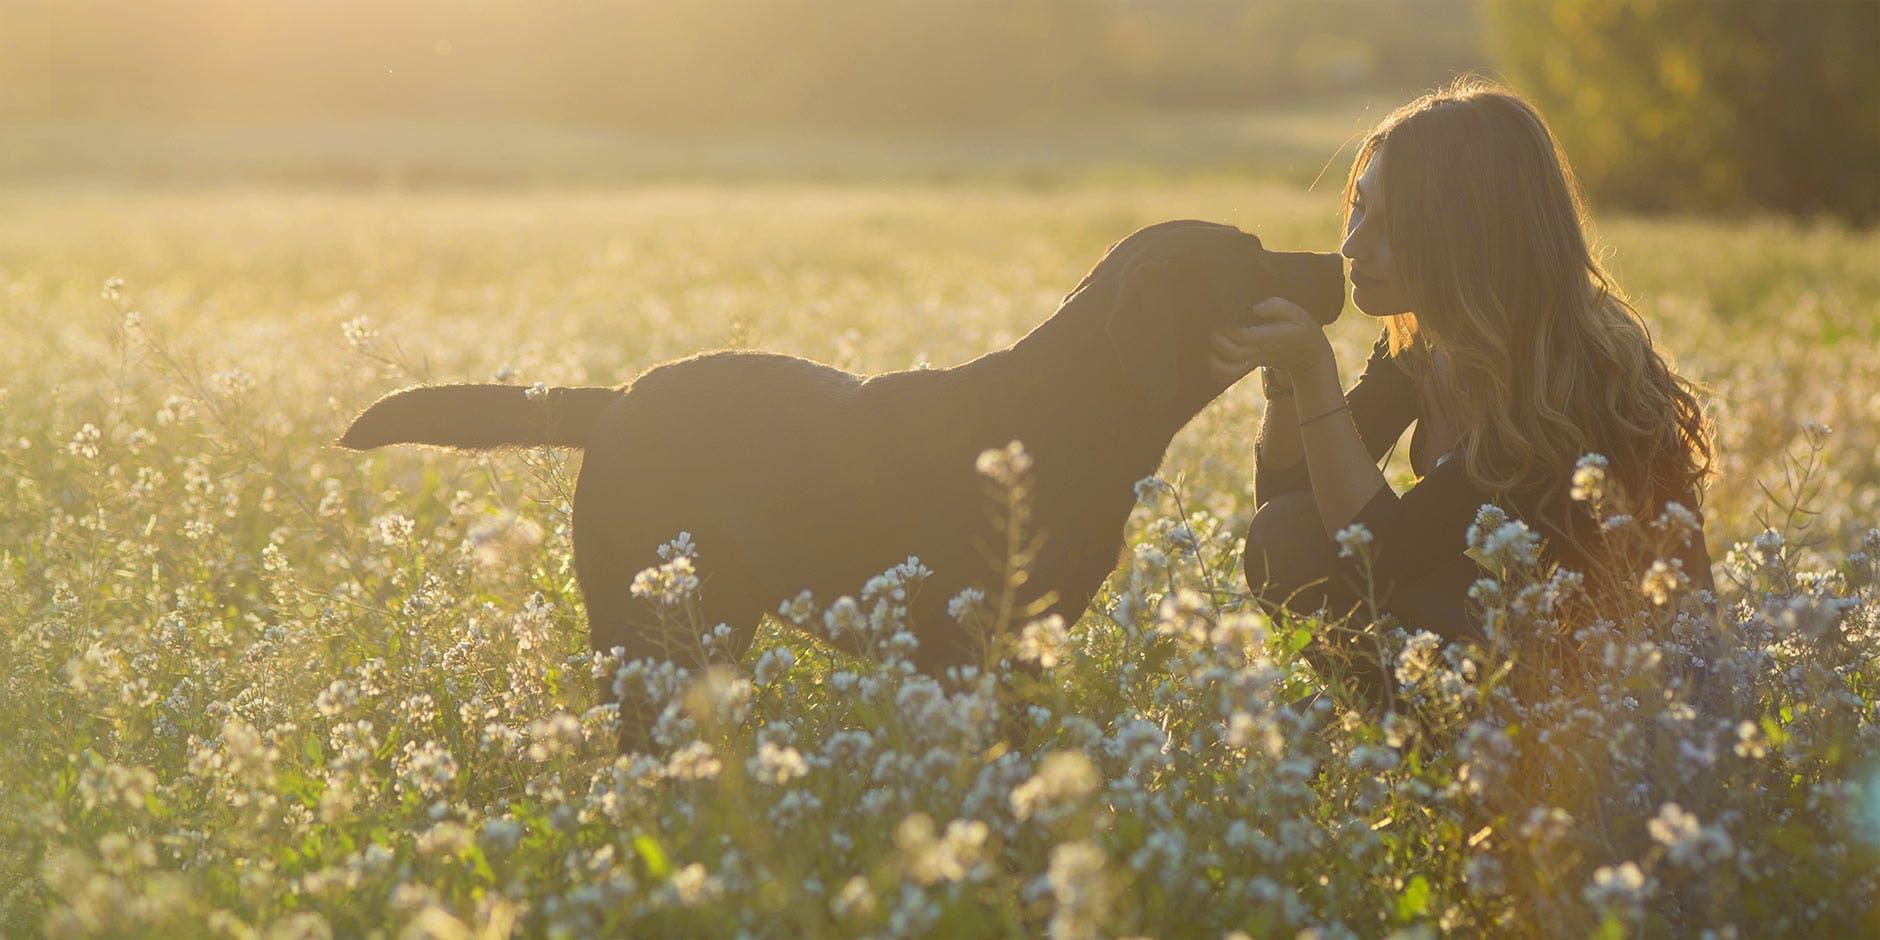 Woman sitting in meadow petting her dog